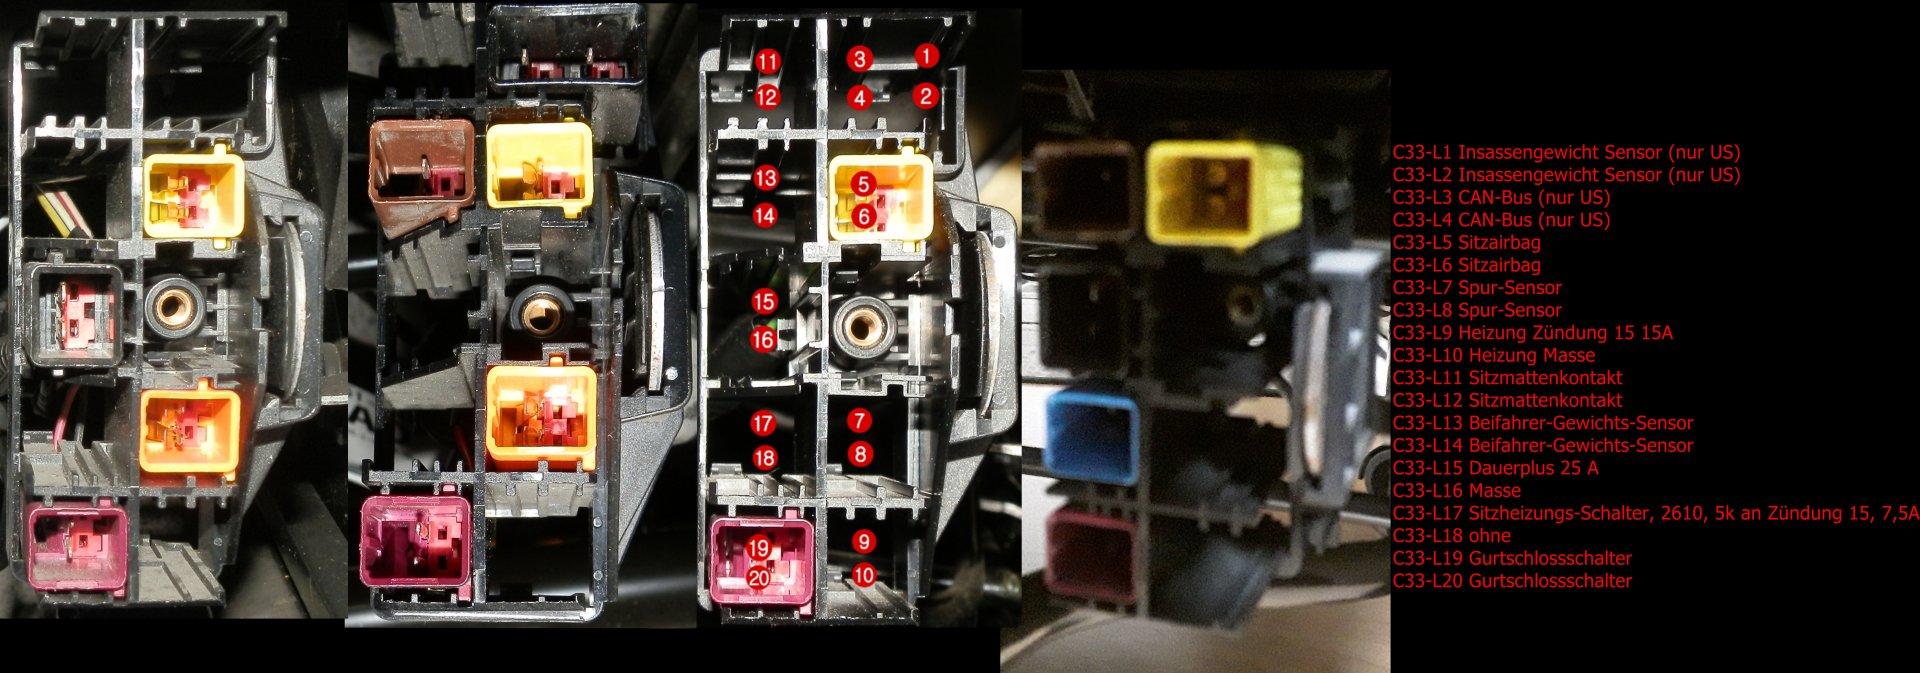 Ford Focus III - Stecker Originalsitze.jpg